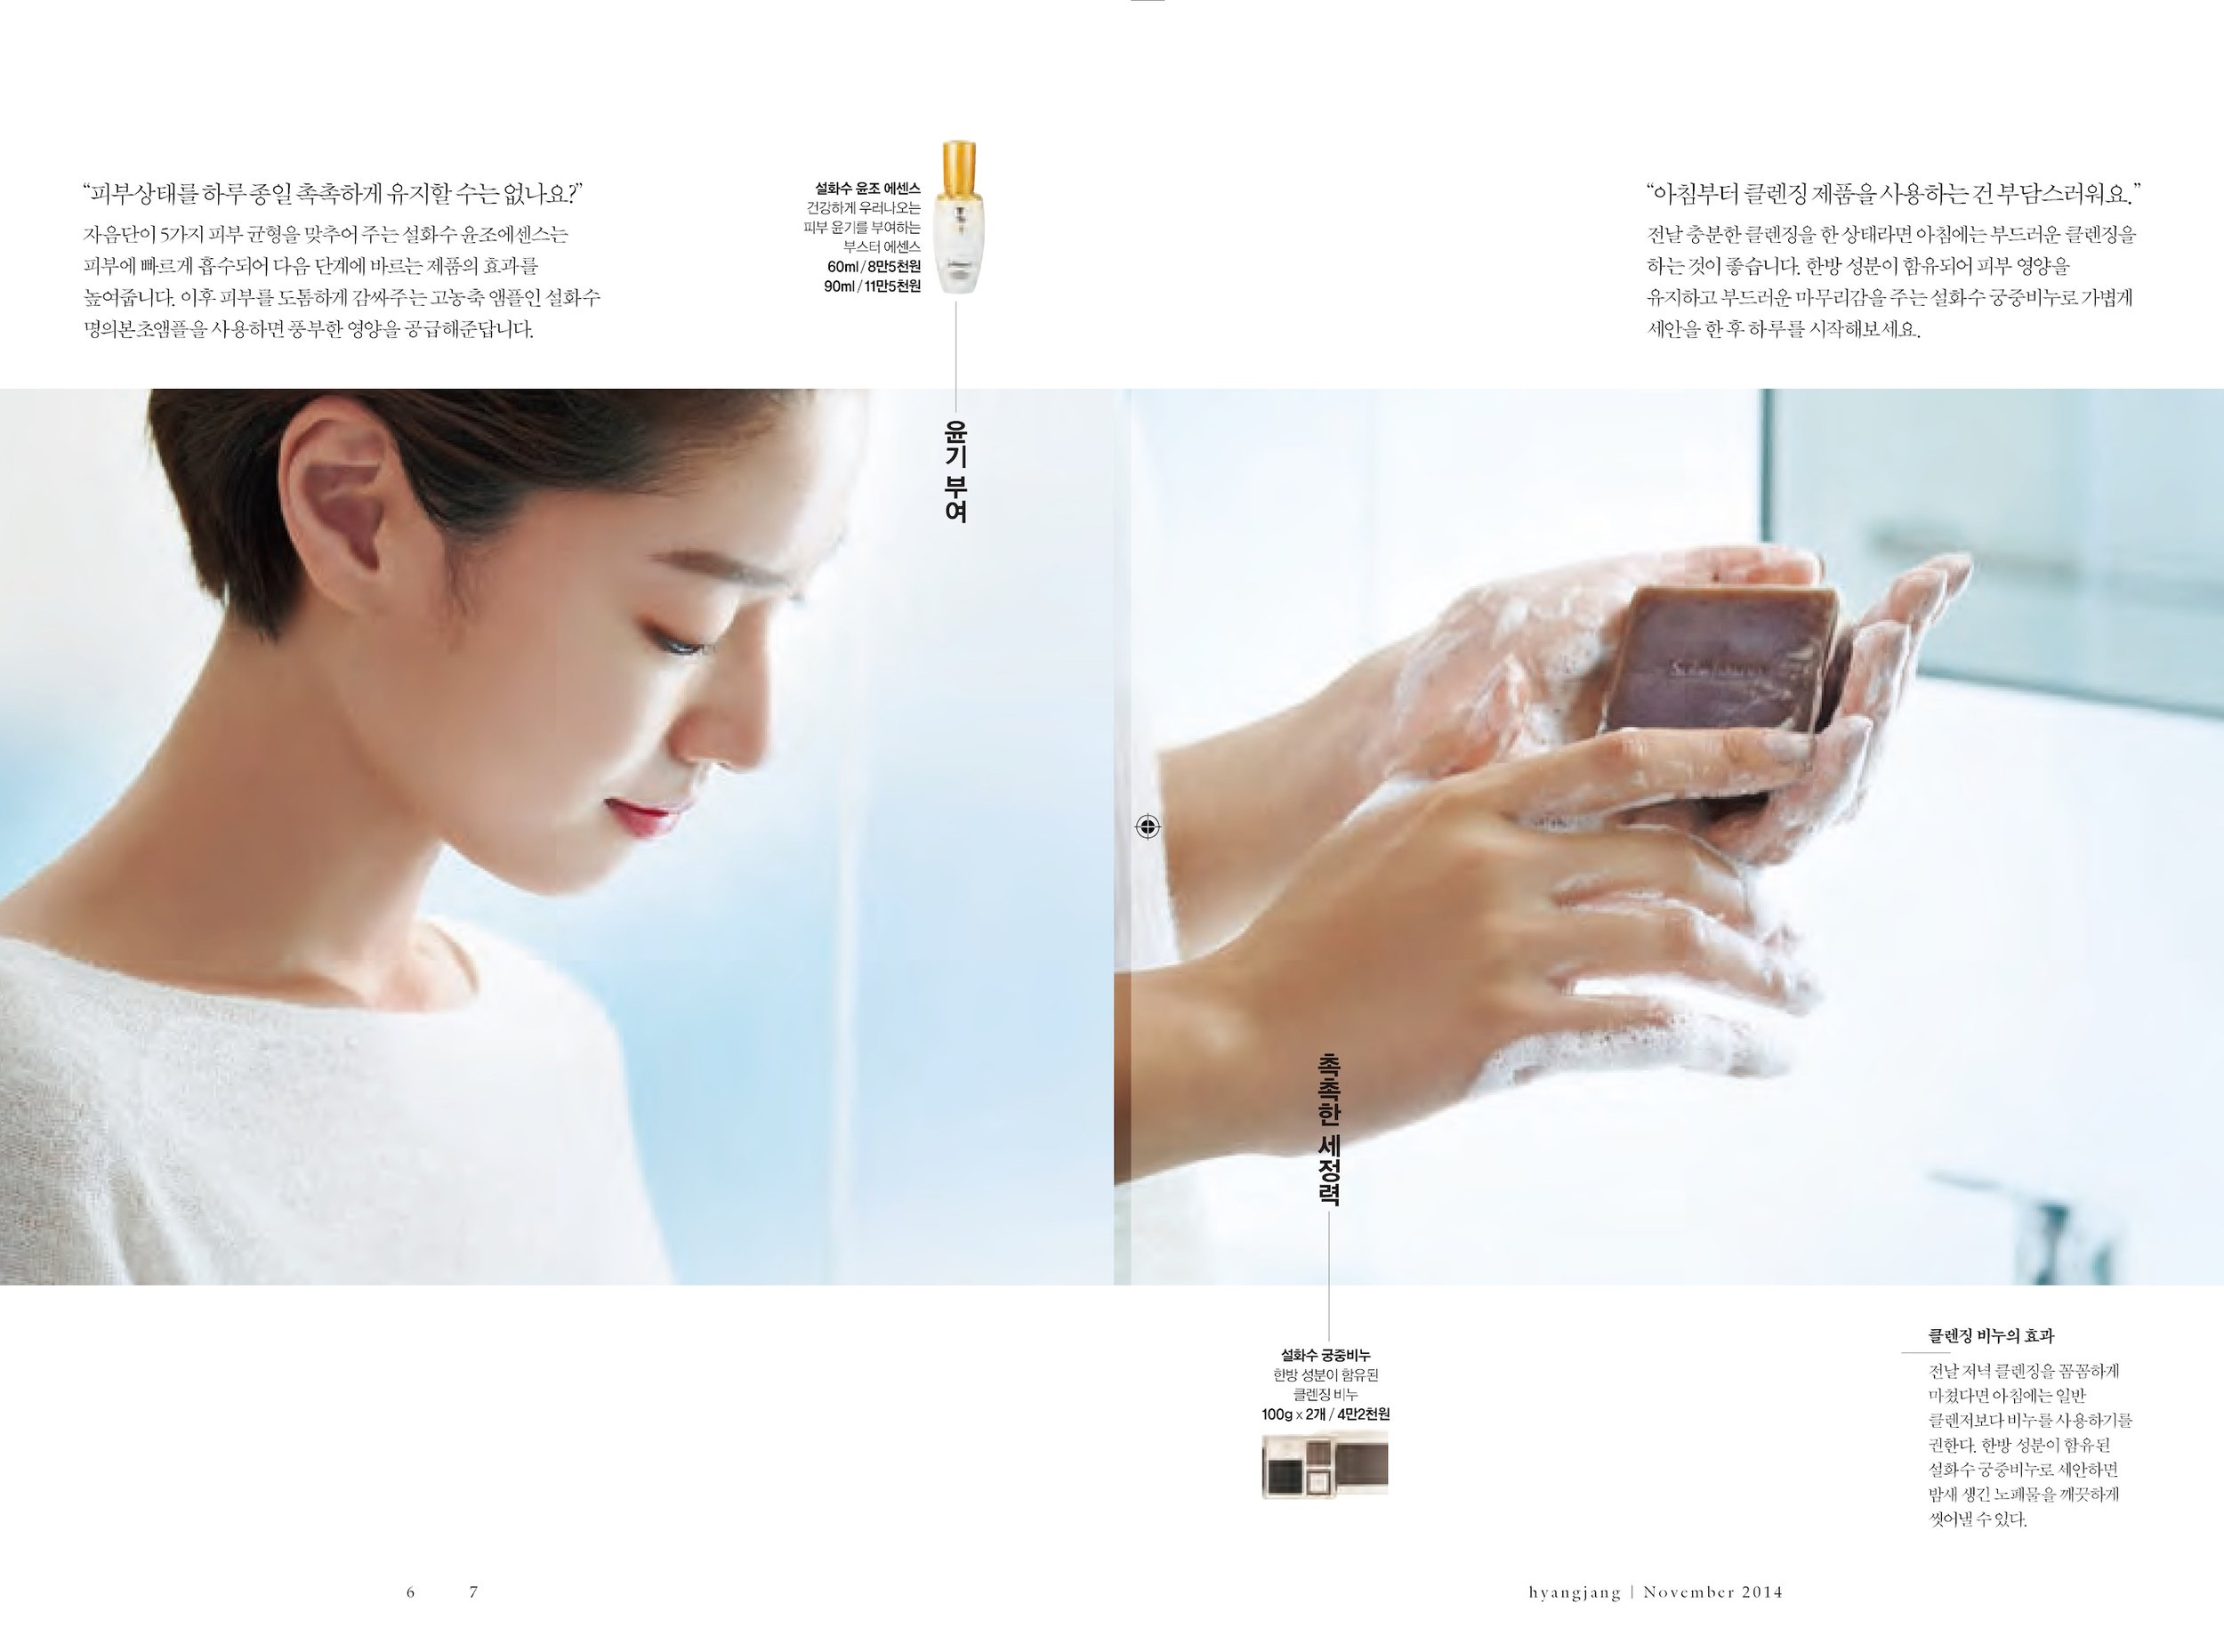 hyangjang-201411_페이지_04.jpeg